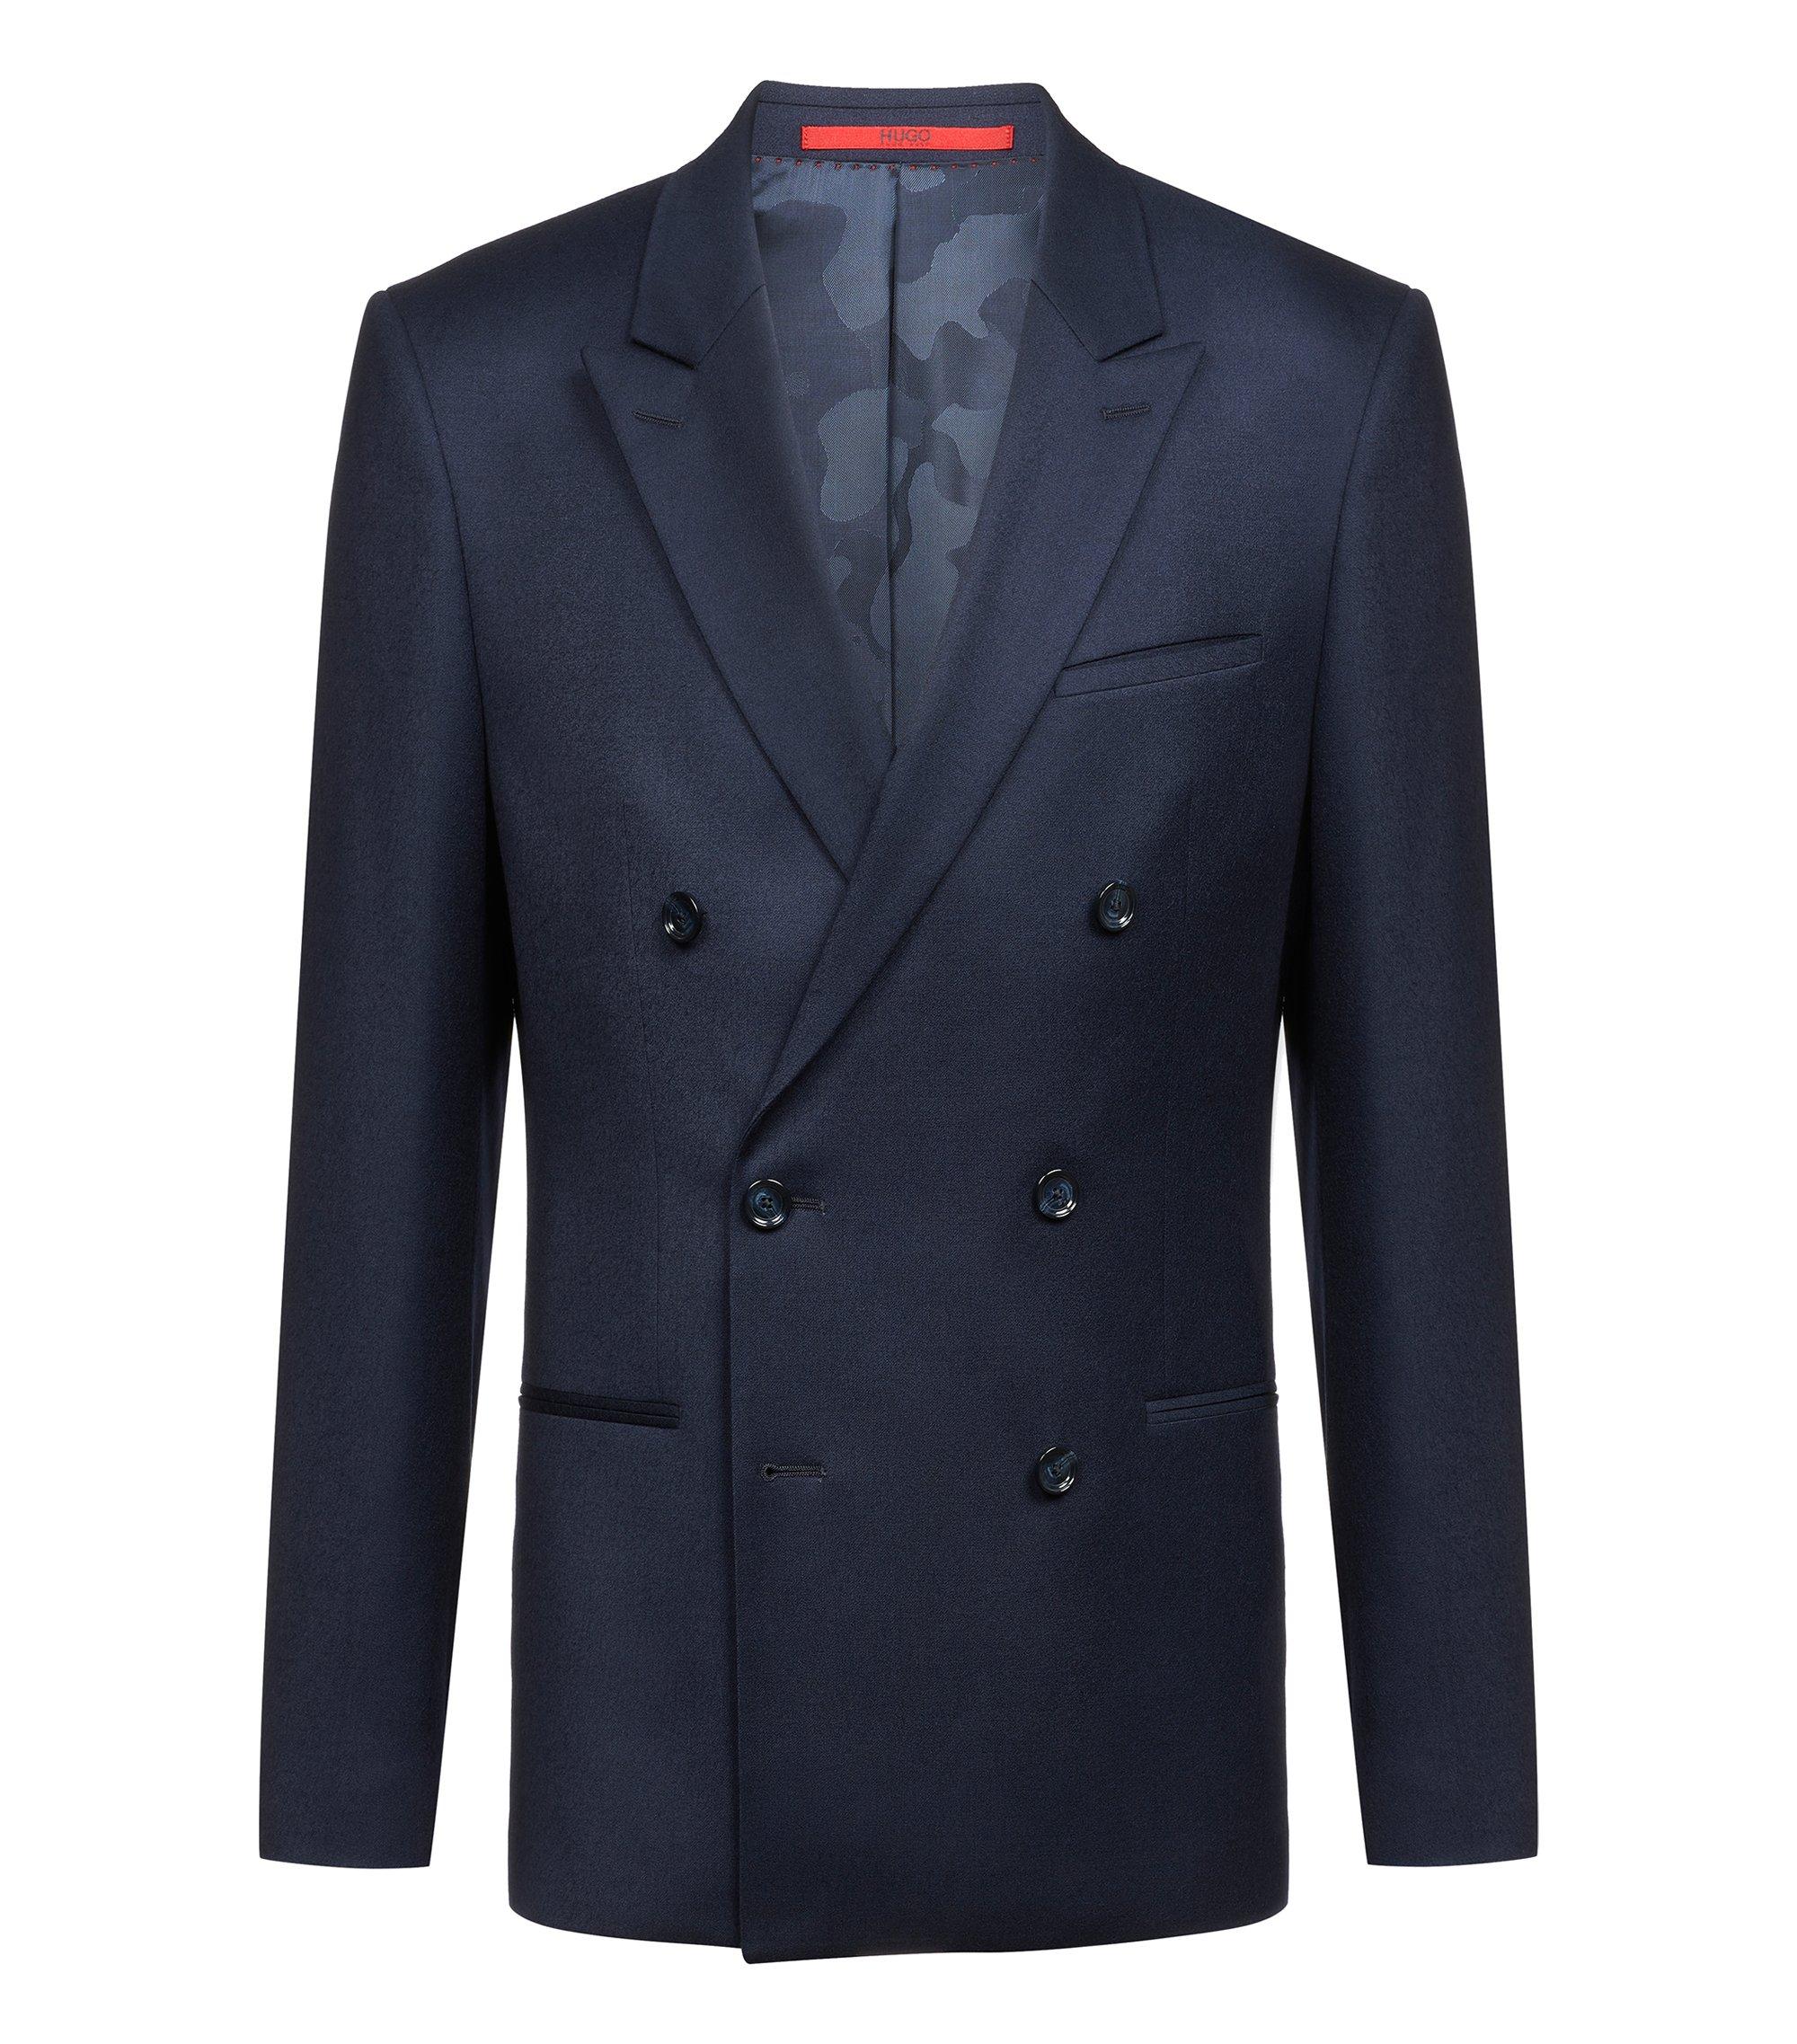 Slim-fit double-breasted jacket in stretch virgin wool, Dark Blue